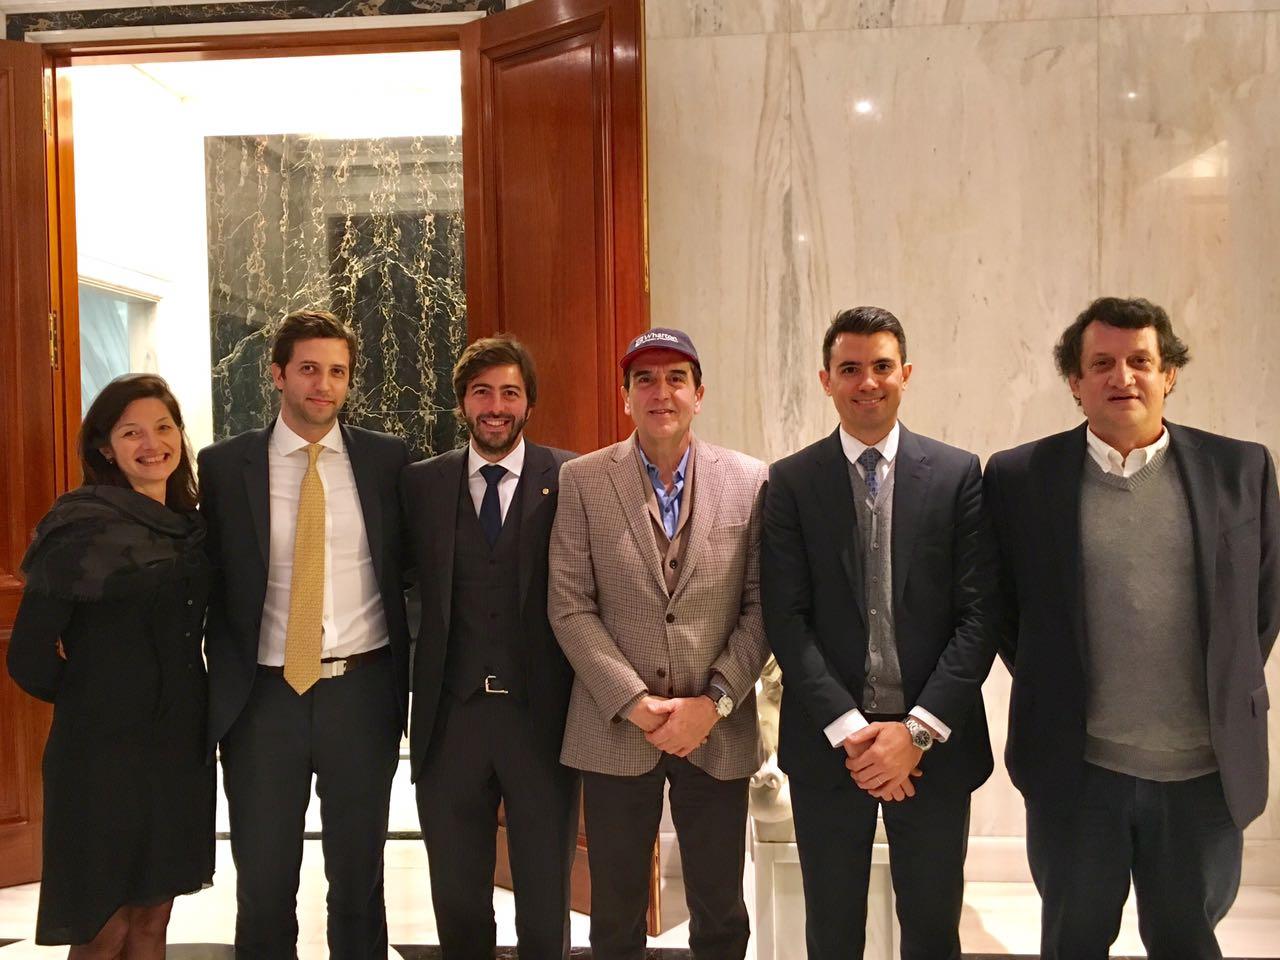 Adriana Butorac, Felipe Fernandez Aramburu, Juan Pereyra Iraola, Carlos Melconian, Matias Rosetto y Pedro Chavance